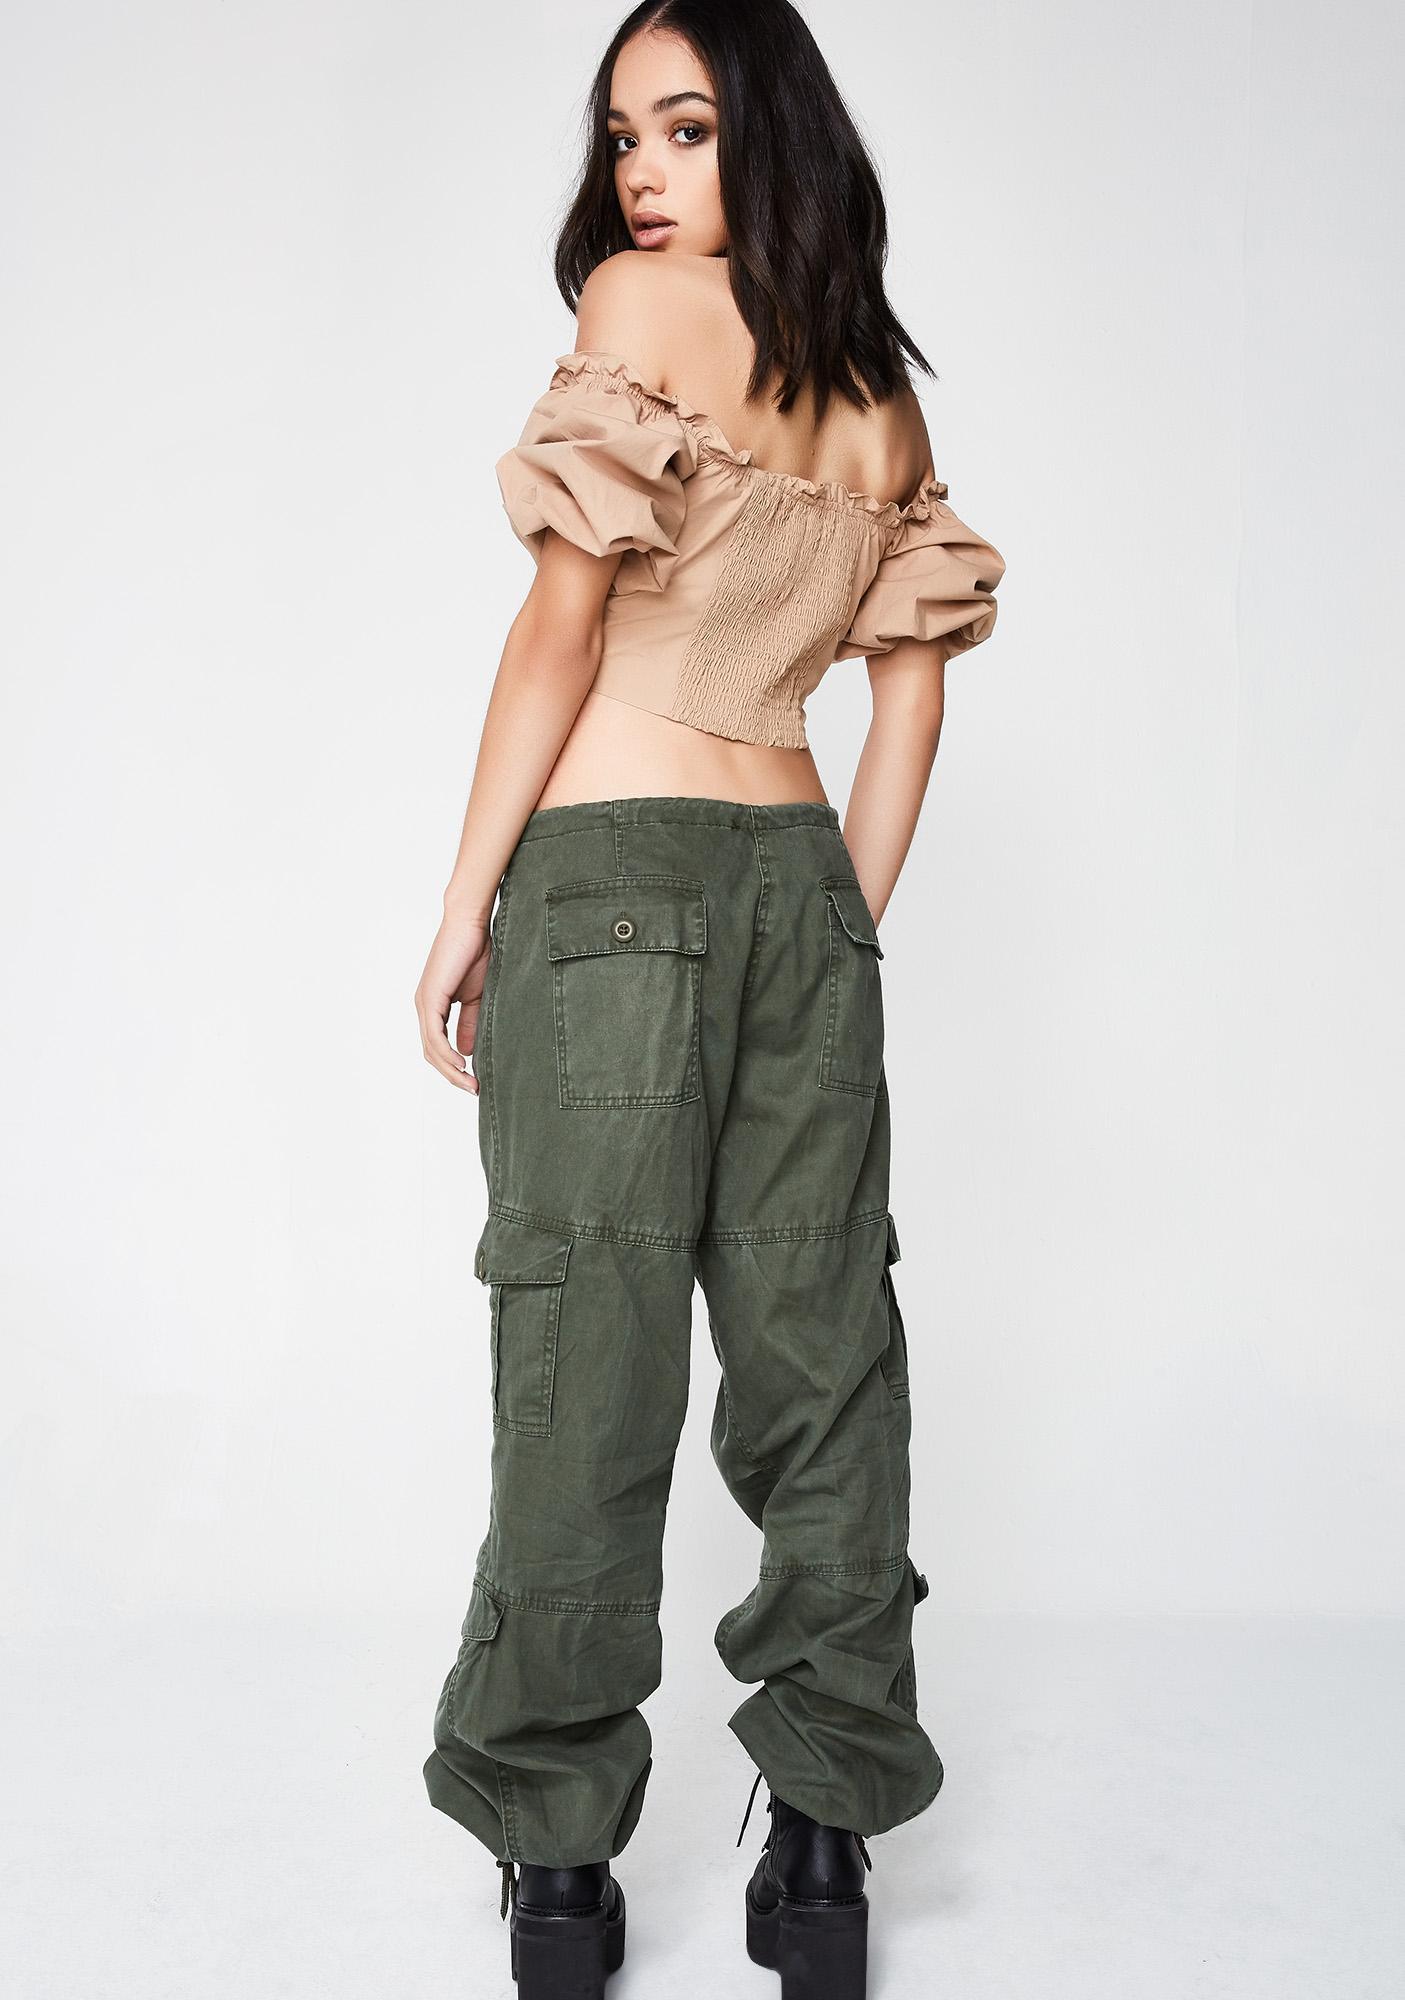 Task Force Drawstring Pants